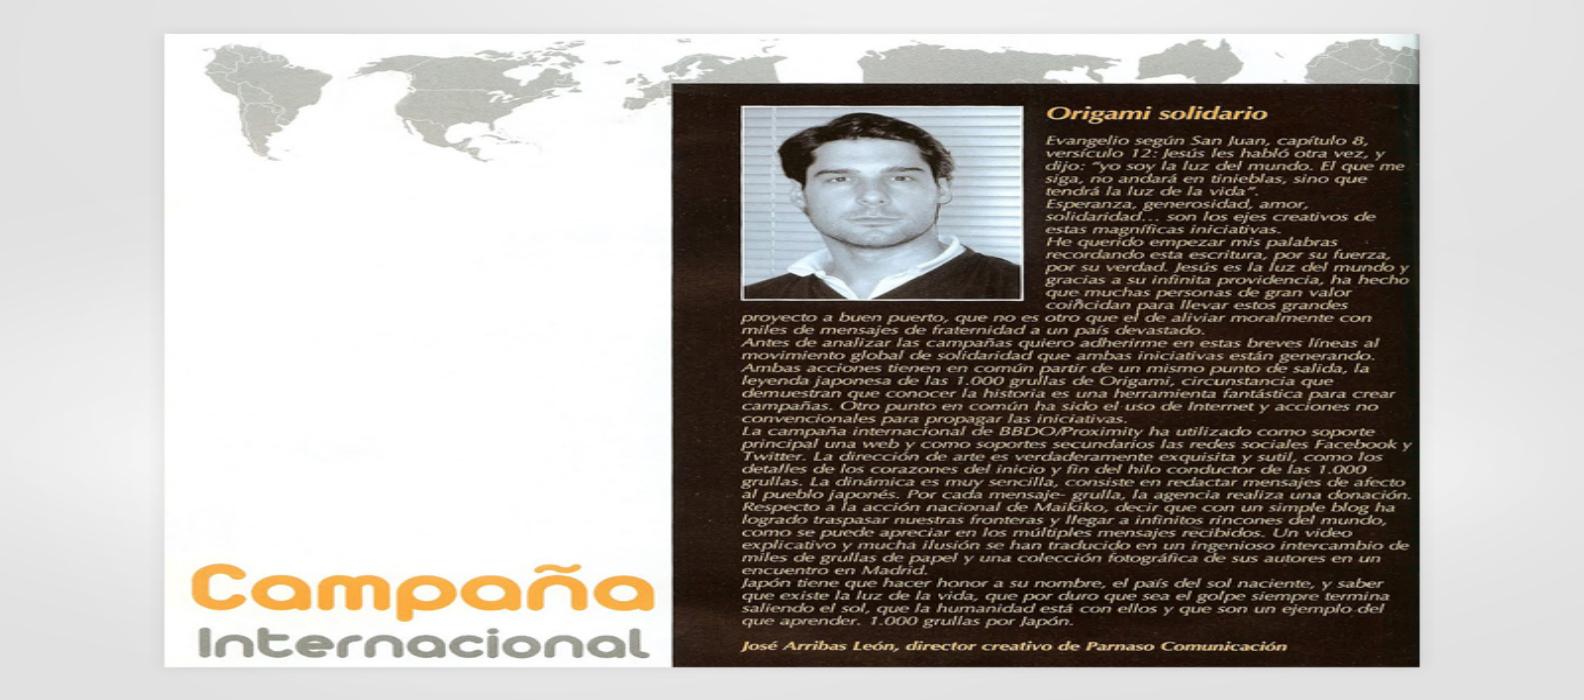 campaña internacional solidaria